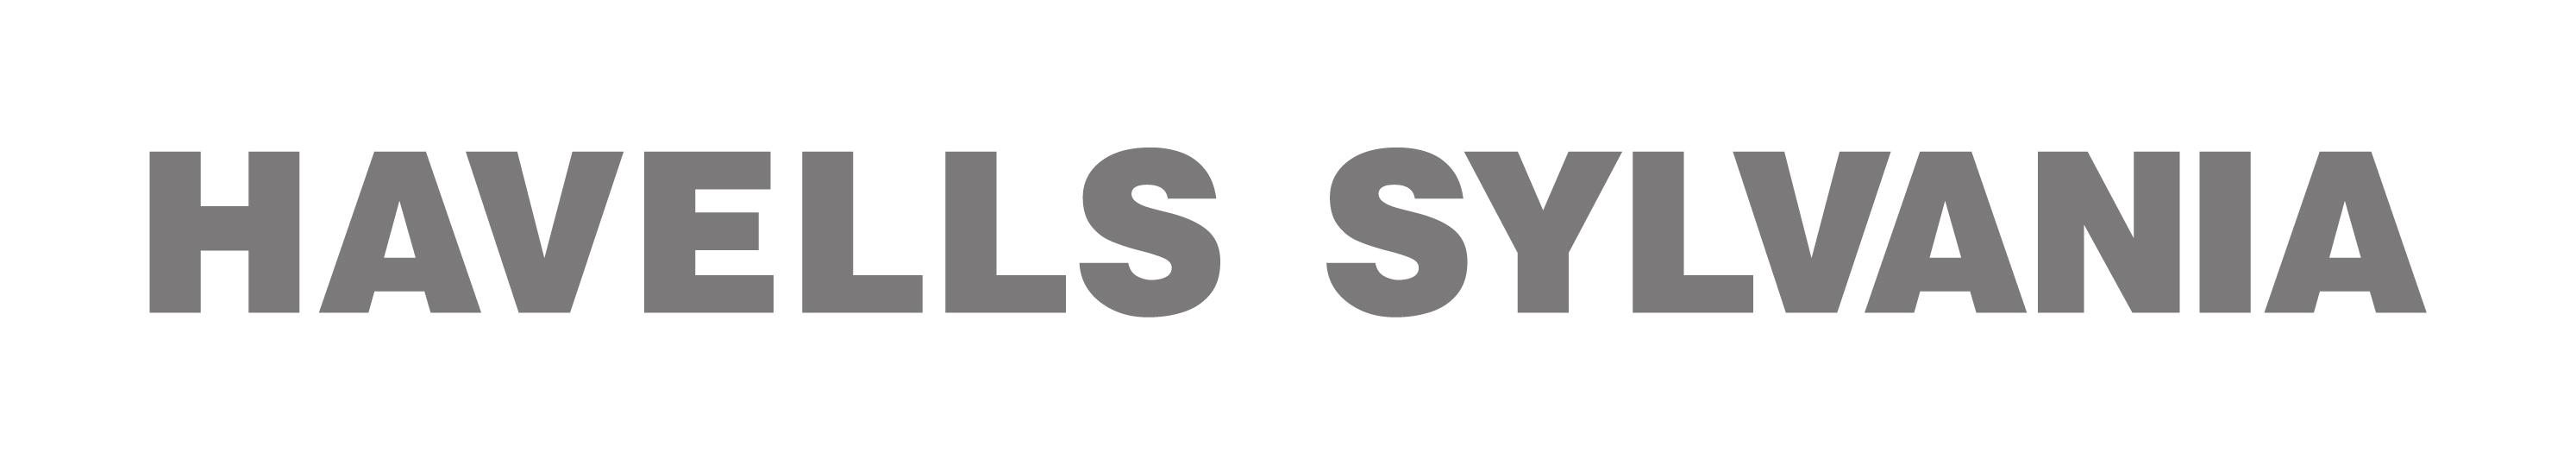 havells sylvania logo